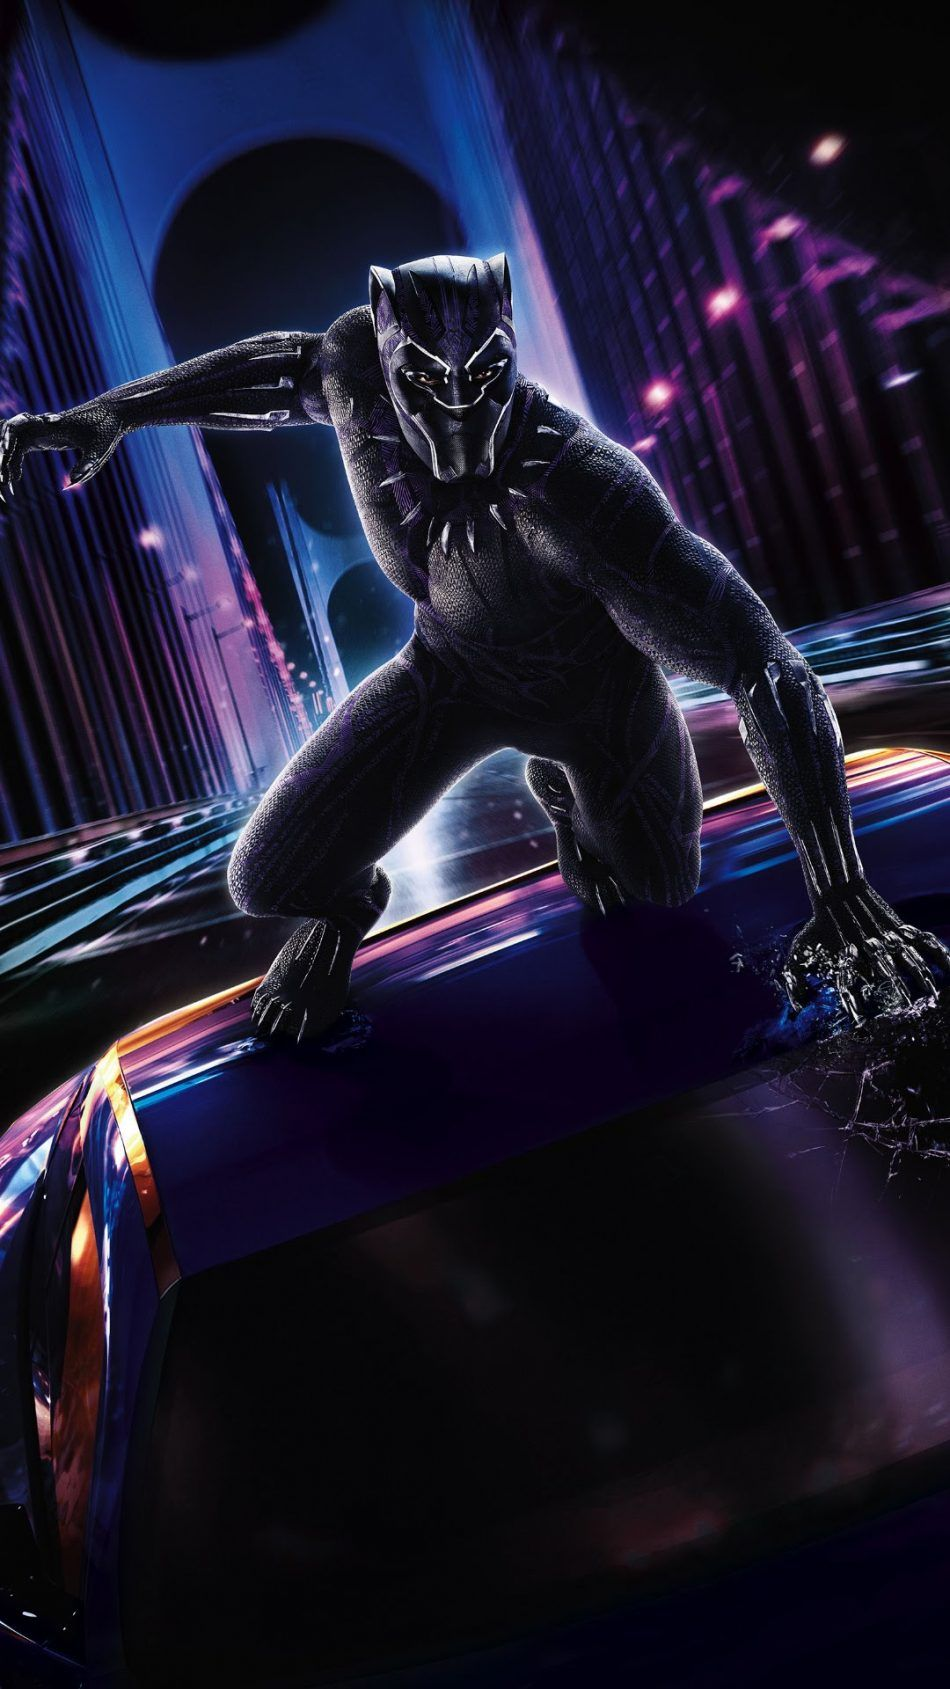 Black Panther Iphone Wallpaper Download Black Panther Marvel Black Panther Black Panther Movie Poster